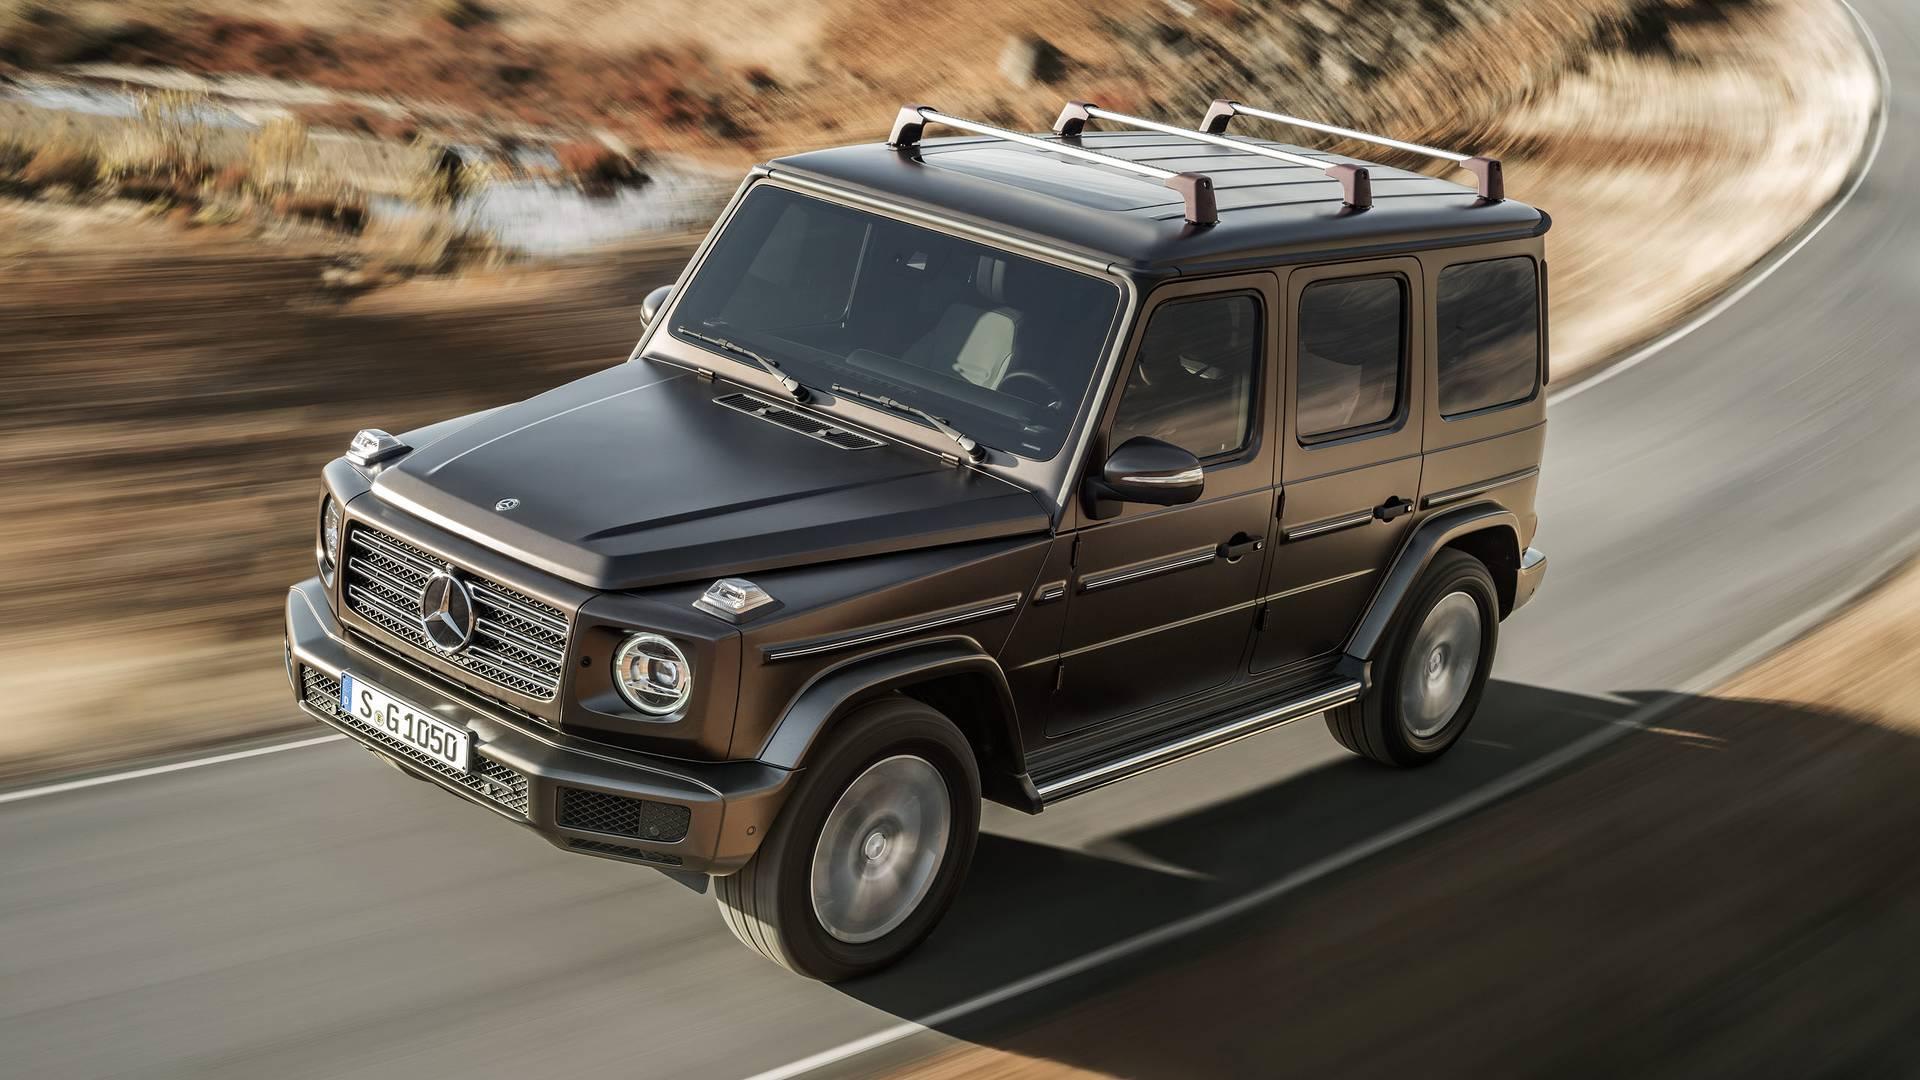 Benz начал производство нового G-Class